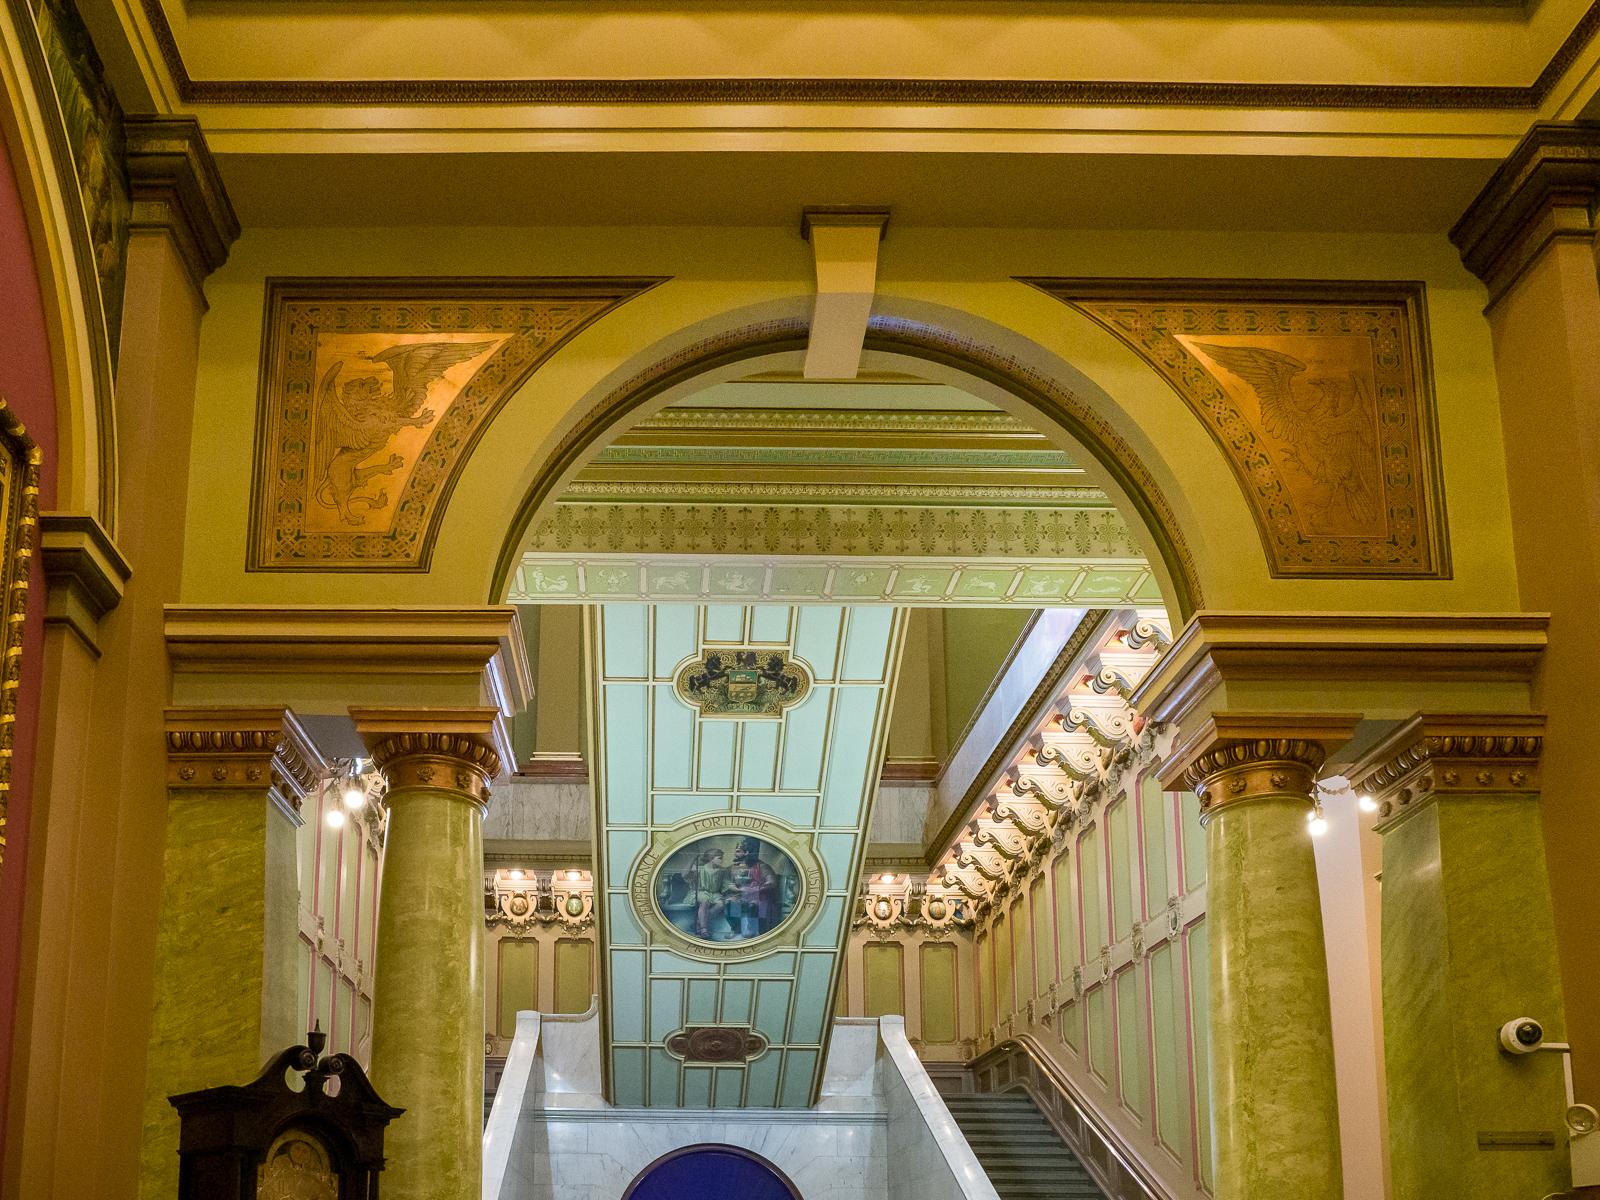 Photographs of the Masonic Temple